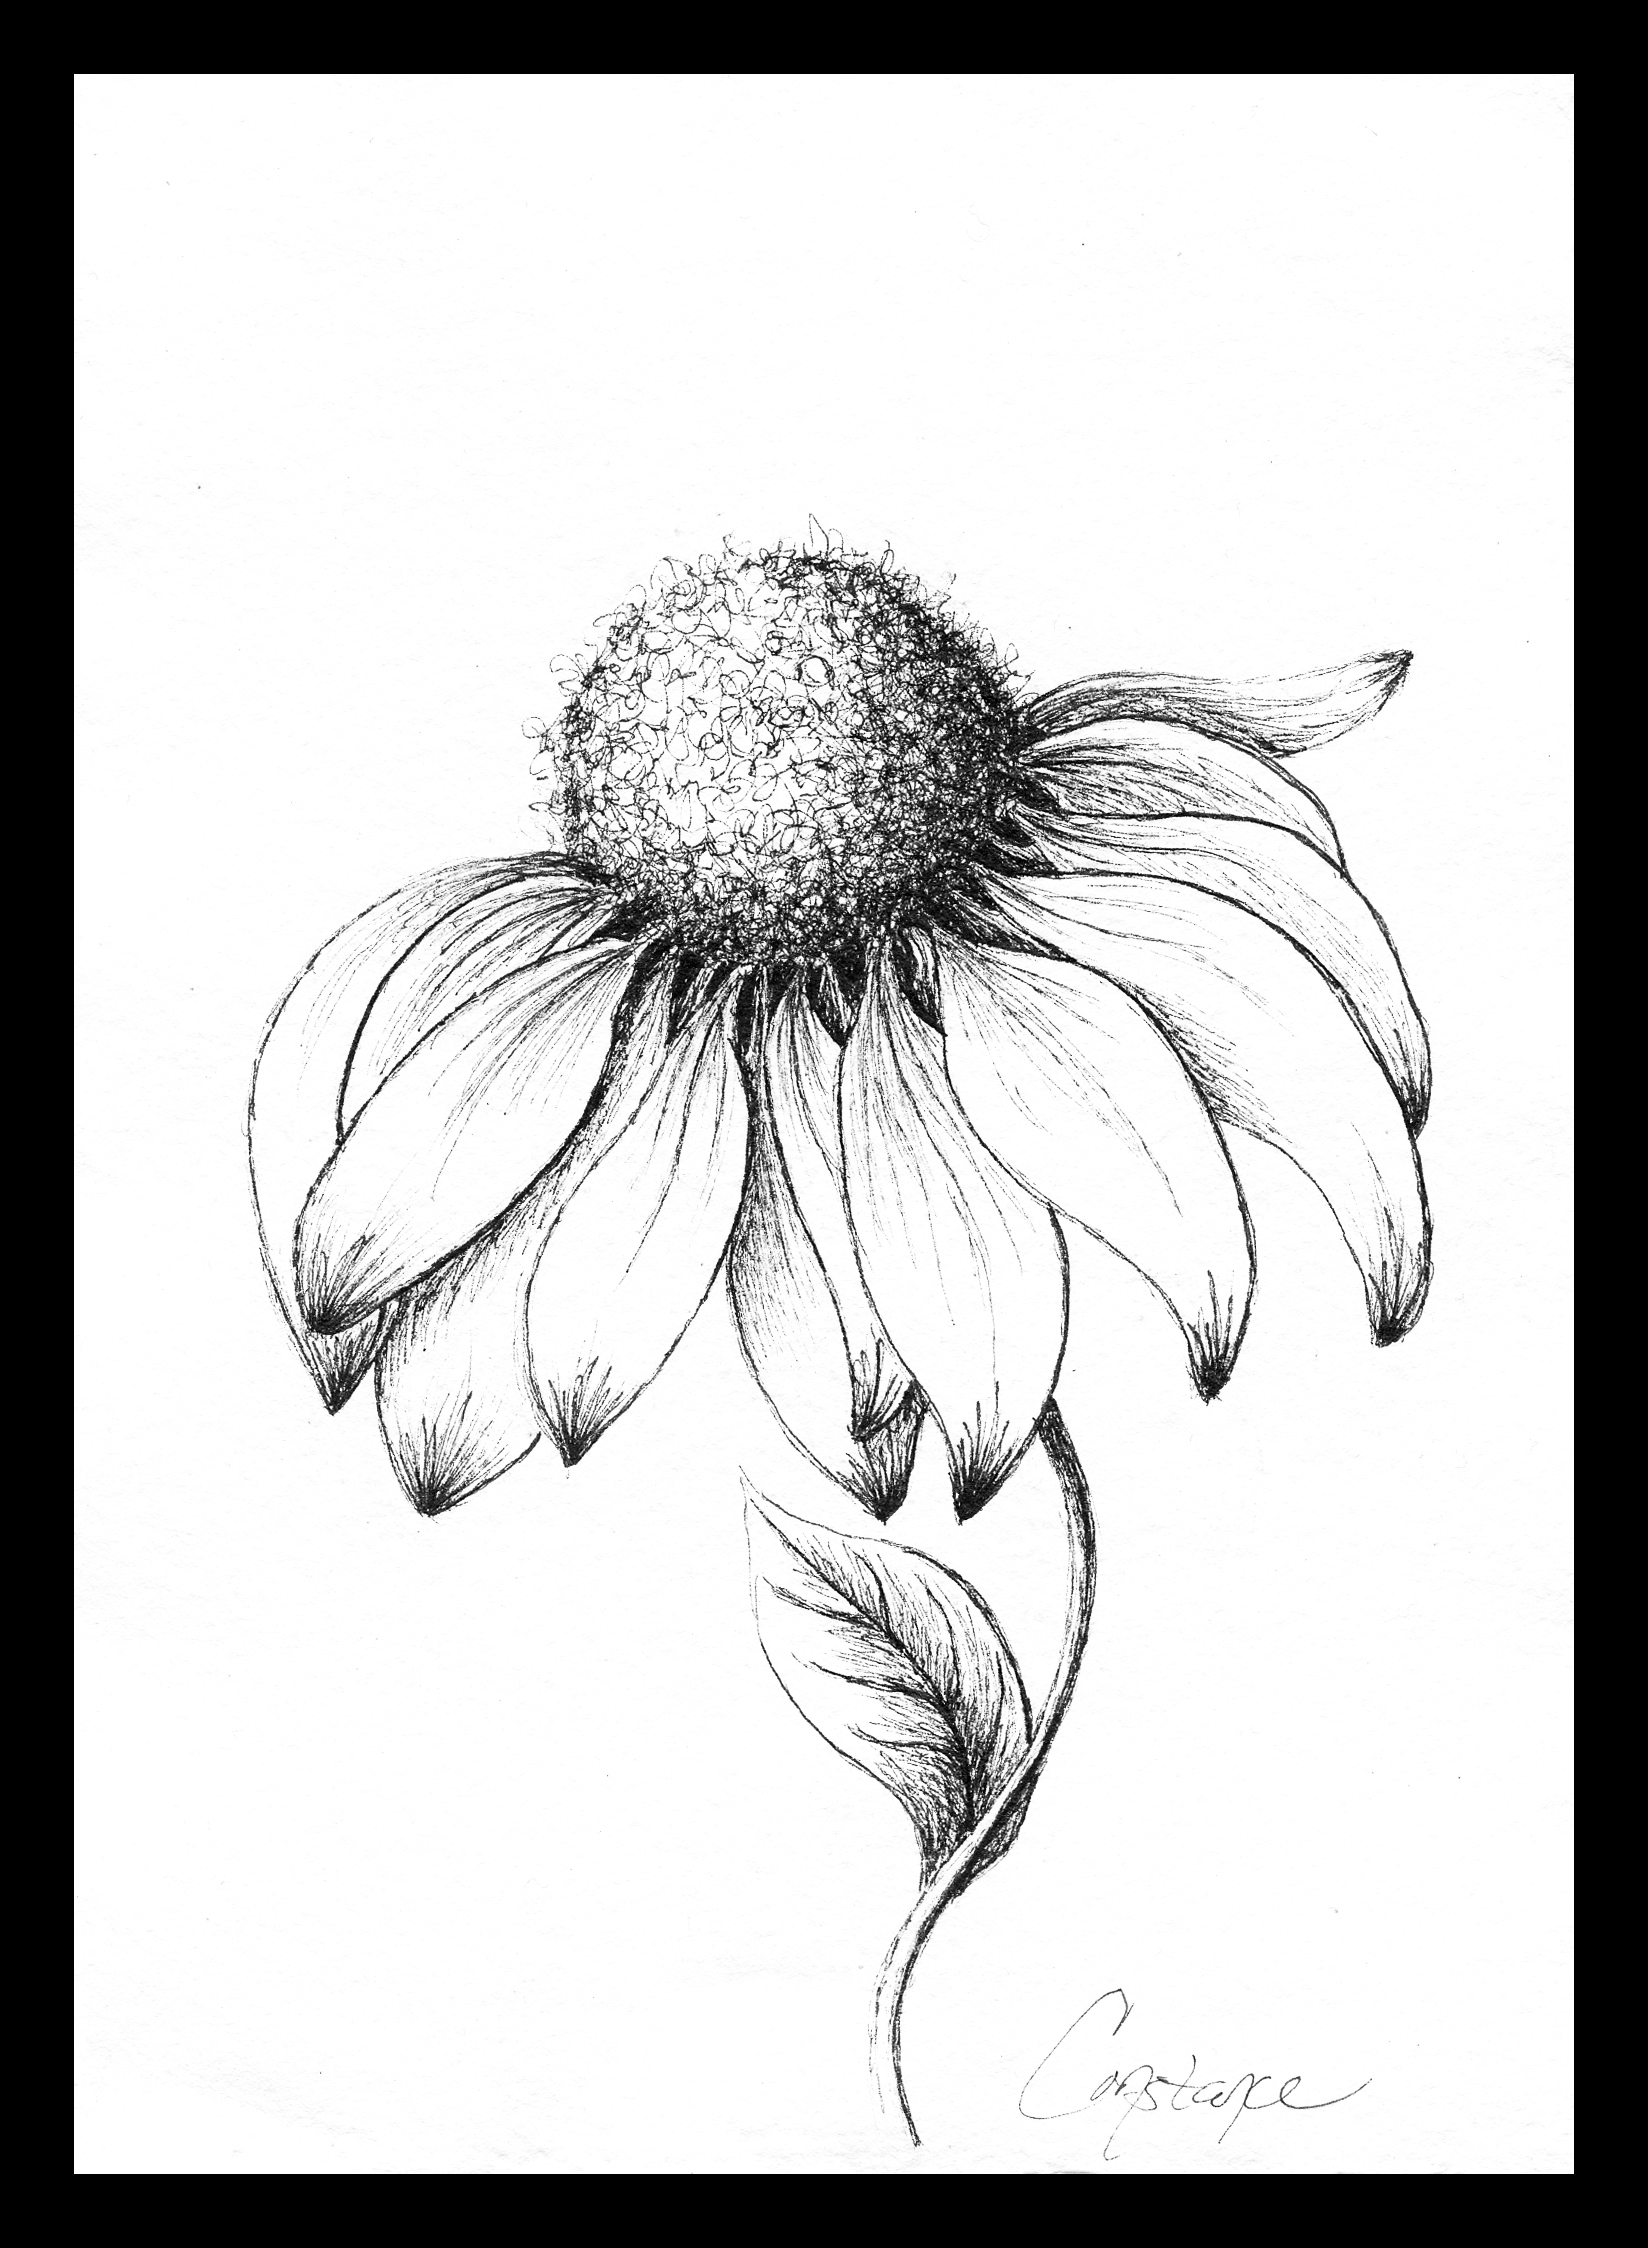 Coneflower in Ink by Constance Reeder Art